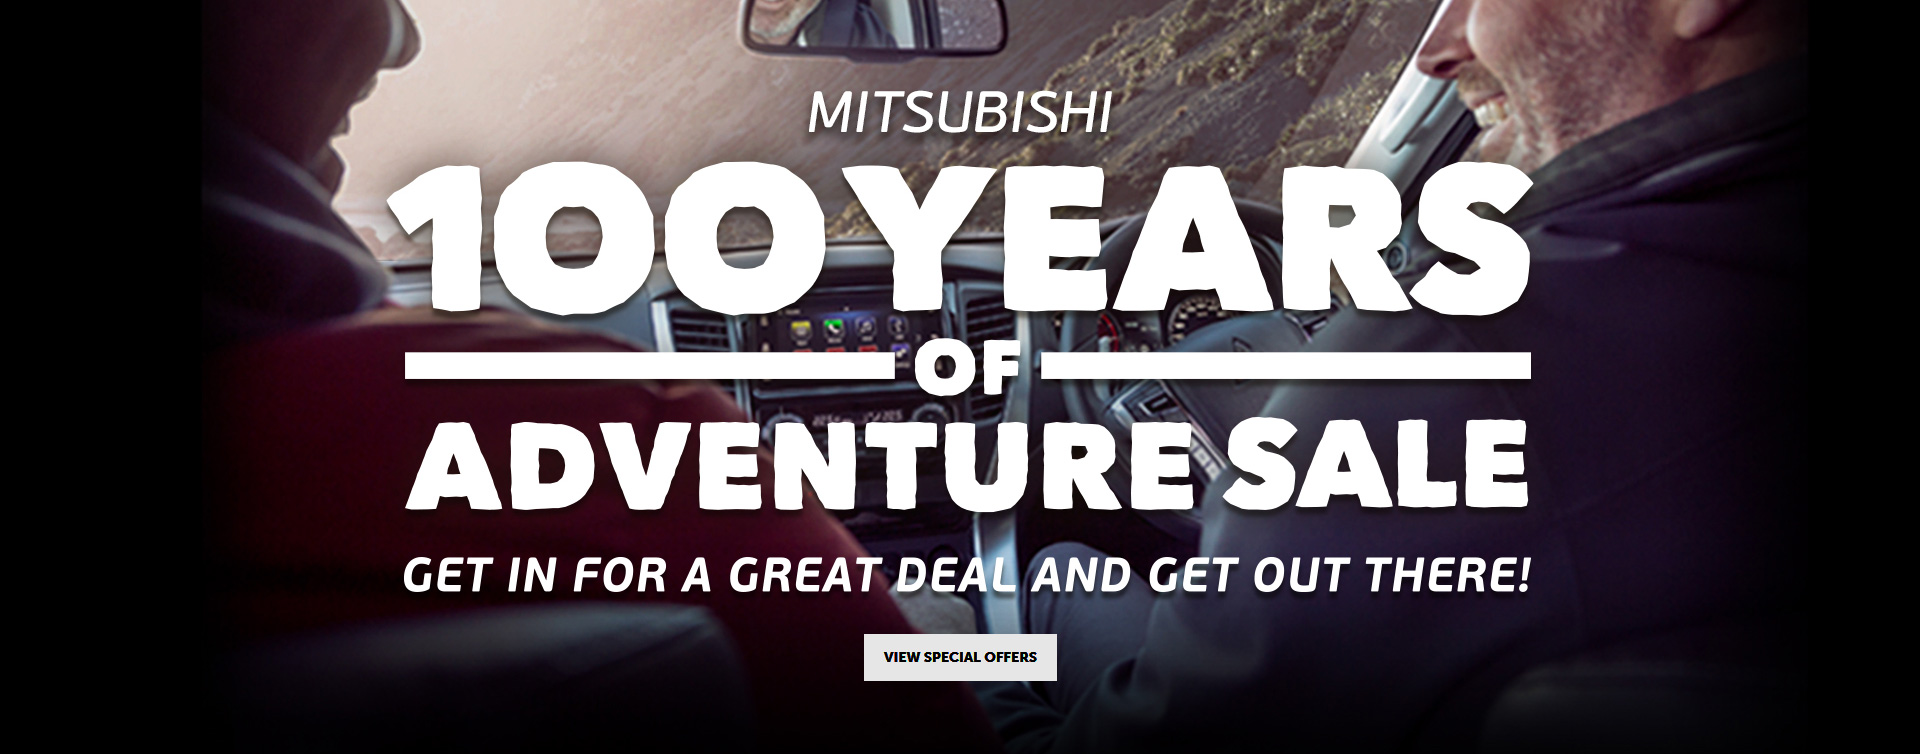 September Offer - Adventure Sale Banner